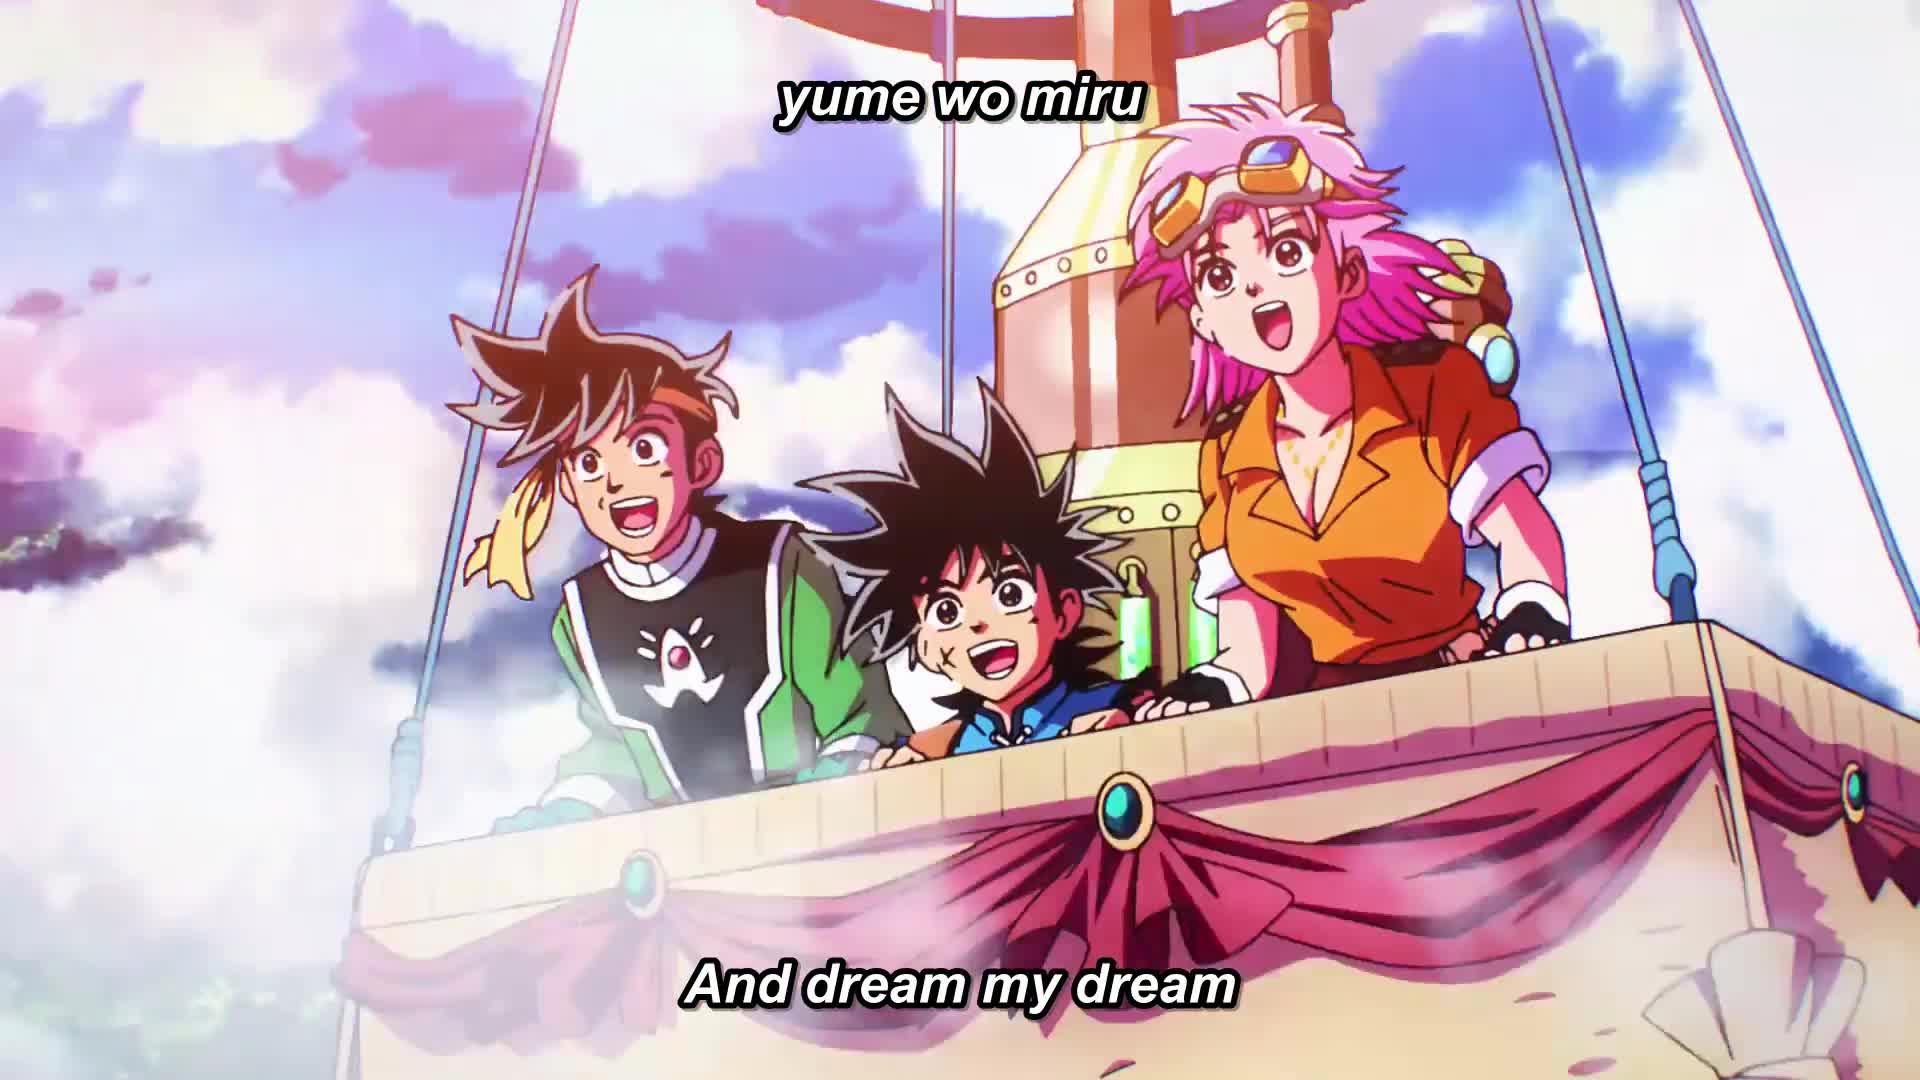 Dragon Quest: Dai no Daibouken (2020)